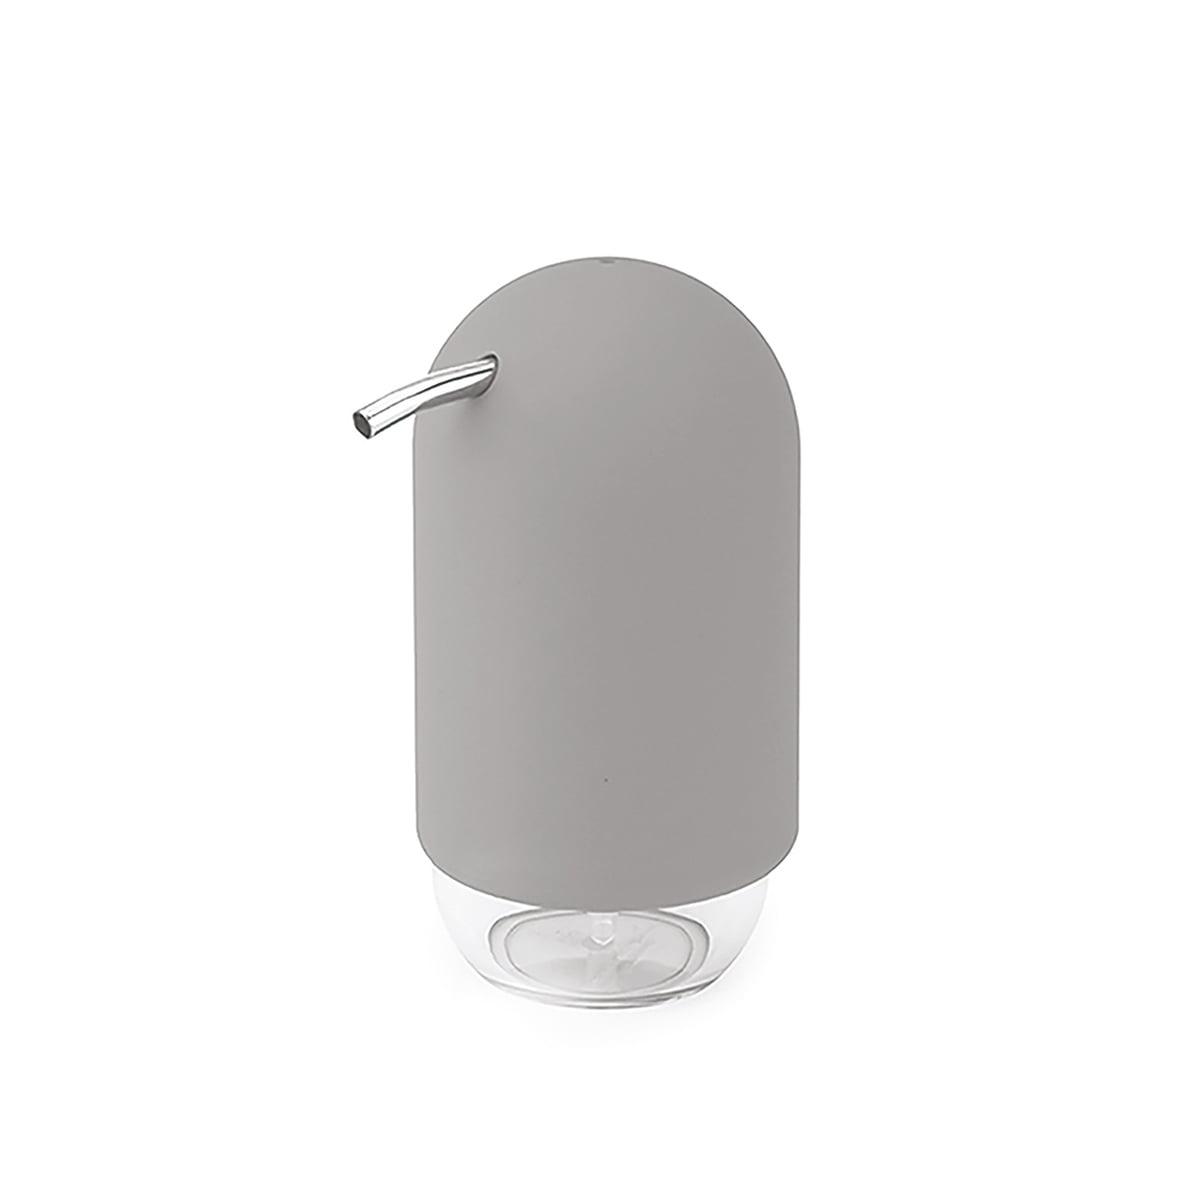 Umbra de Savon Bol Touch ovales repose-savon Soft Touch plastique pastel